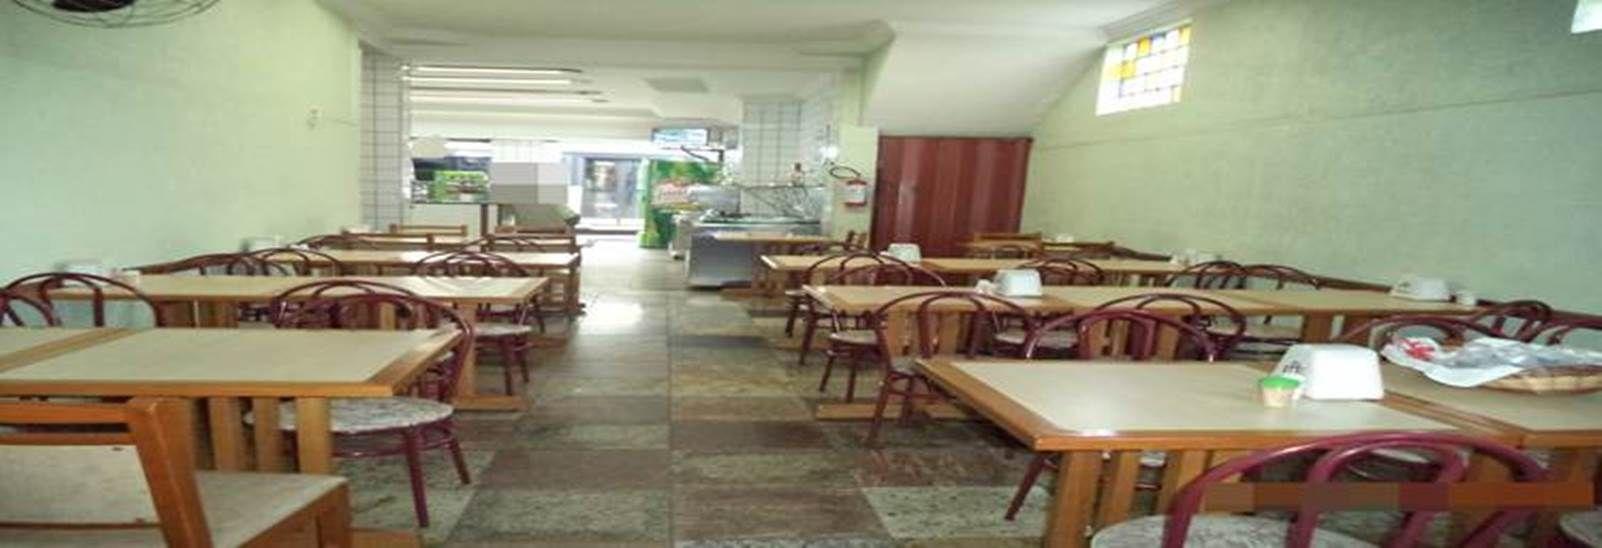 Lanchonete / Restaurante Tradicional Zona Leste